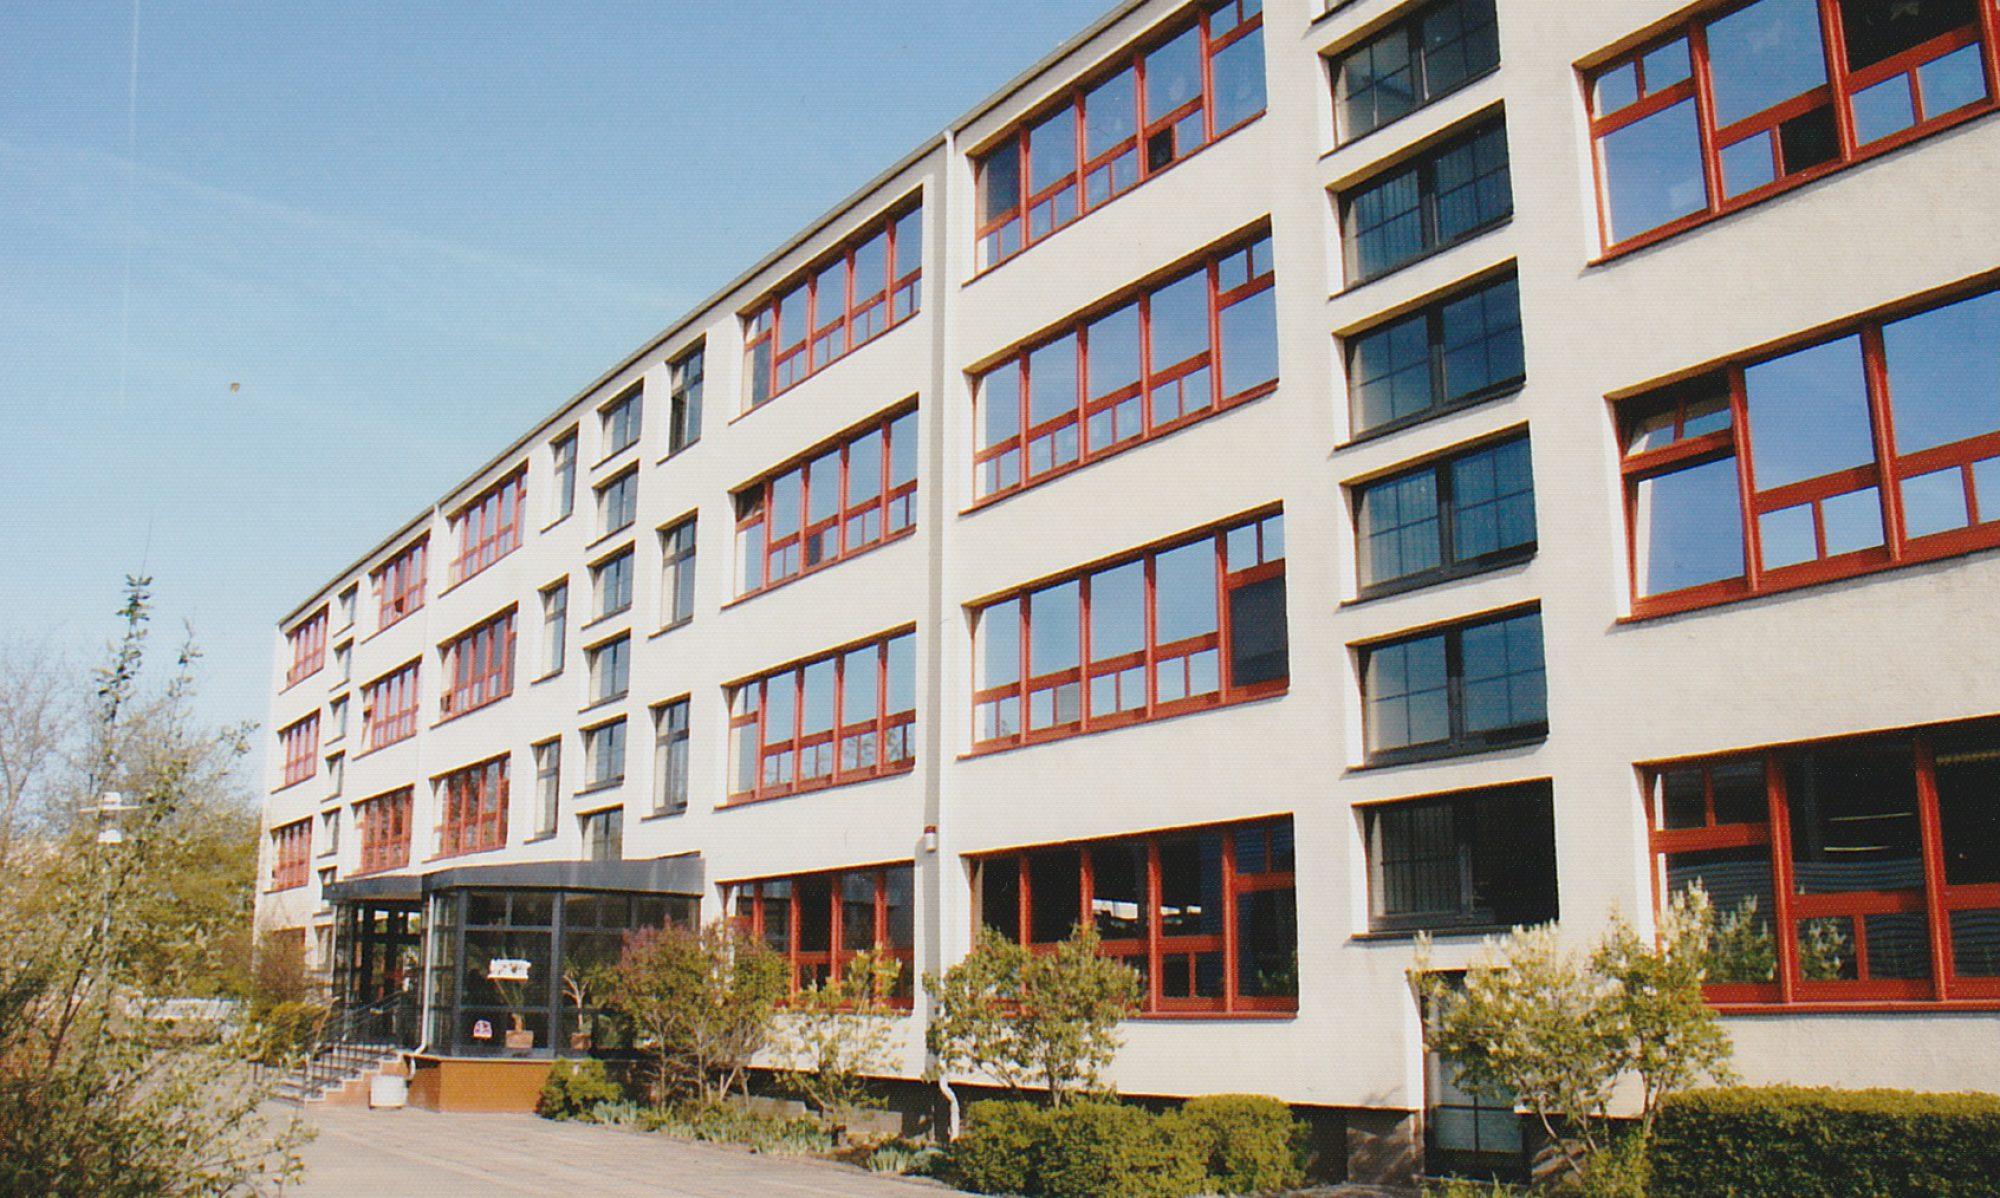 Astrid Lindgren Grundschule